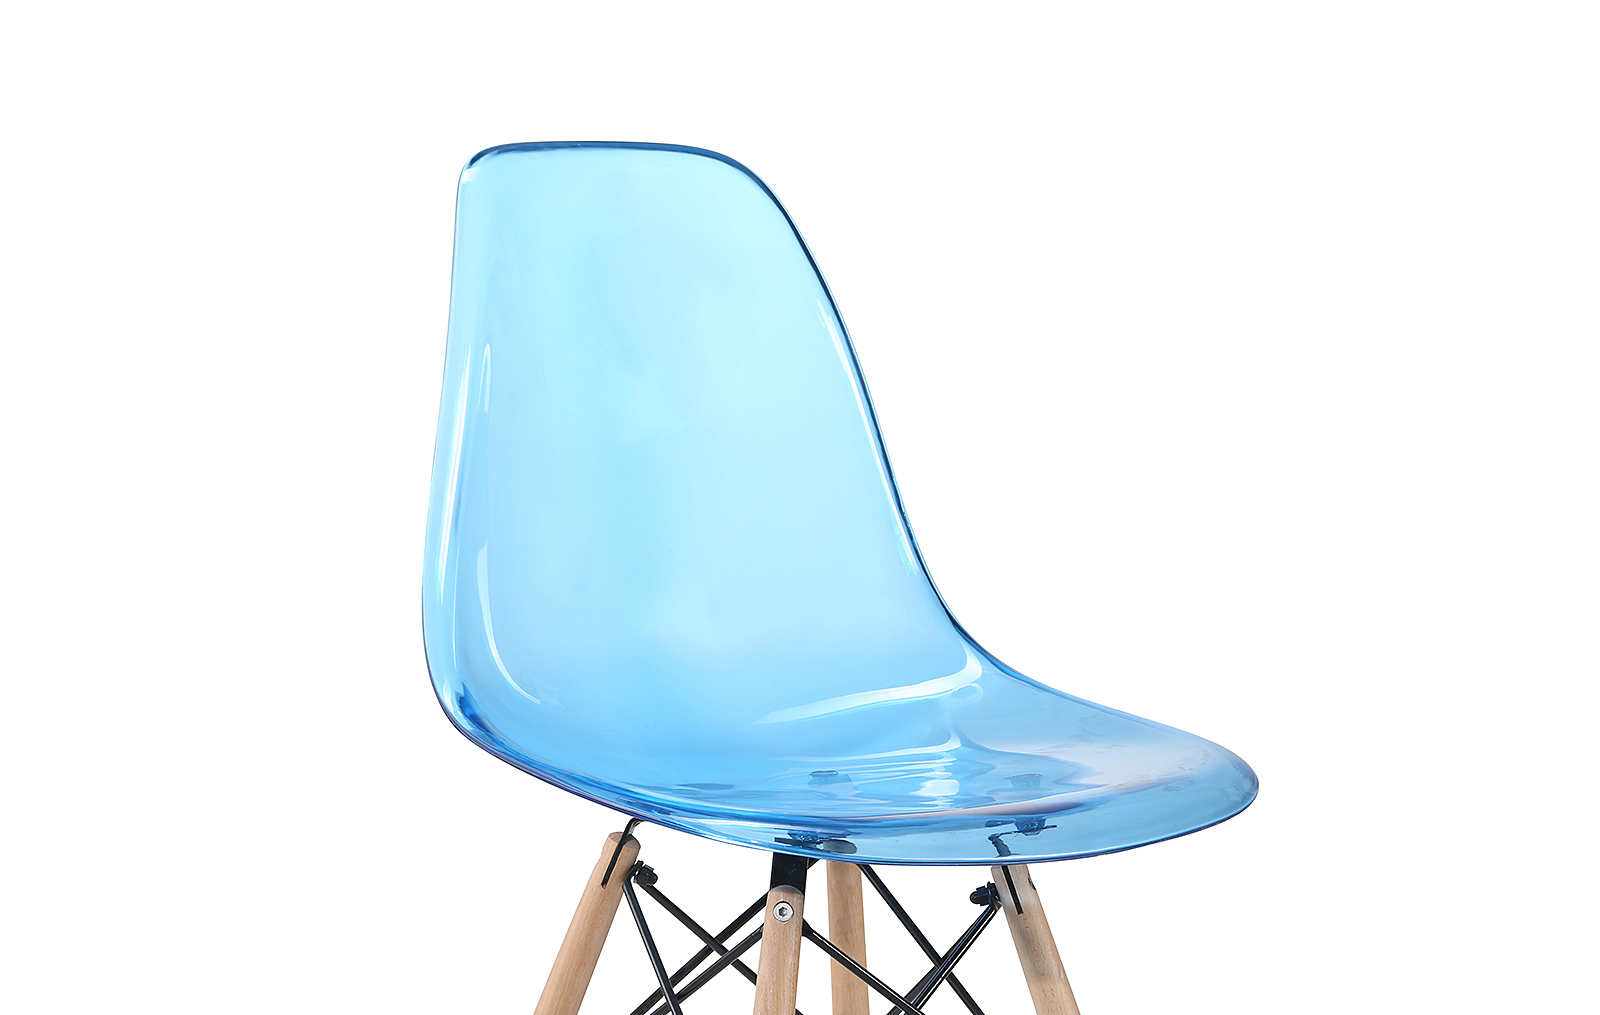 Стул ESF PW071PC blue (синий) в стиле EAMES синий